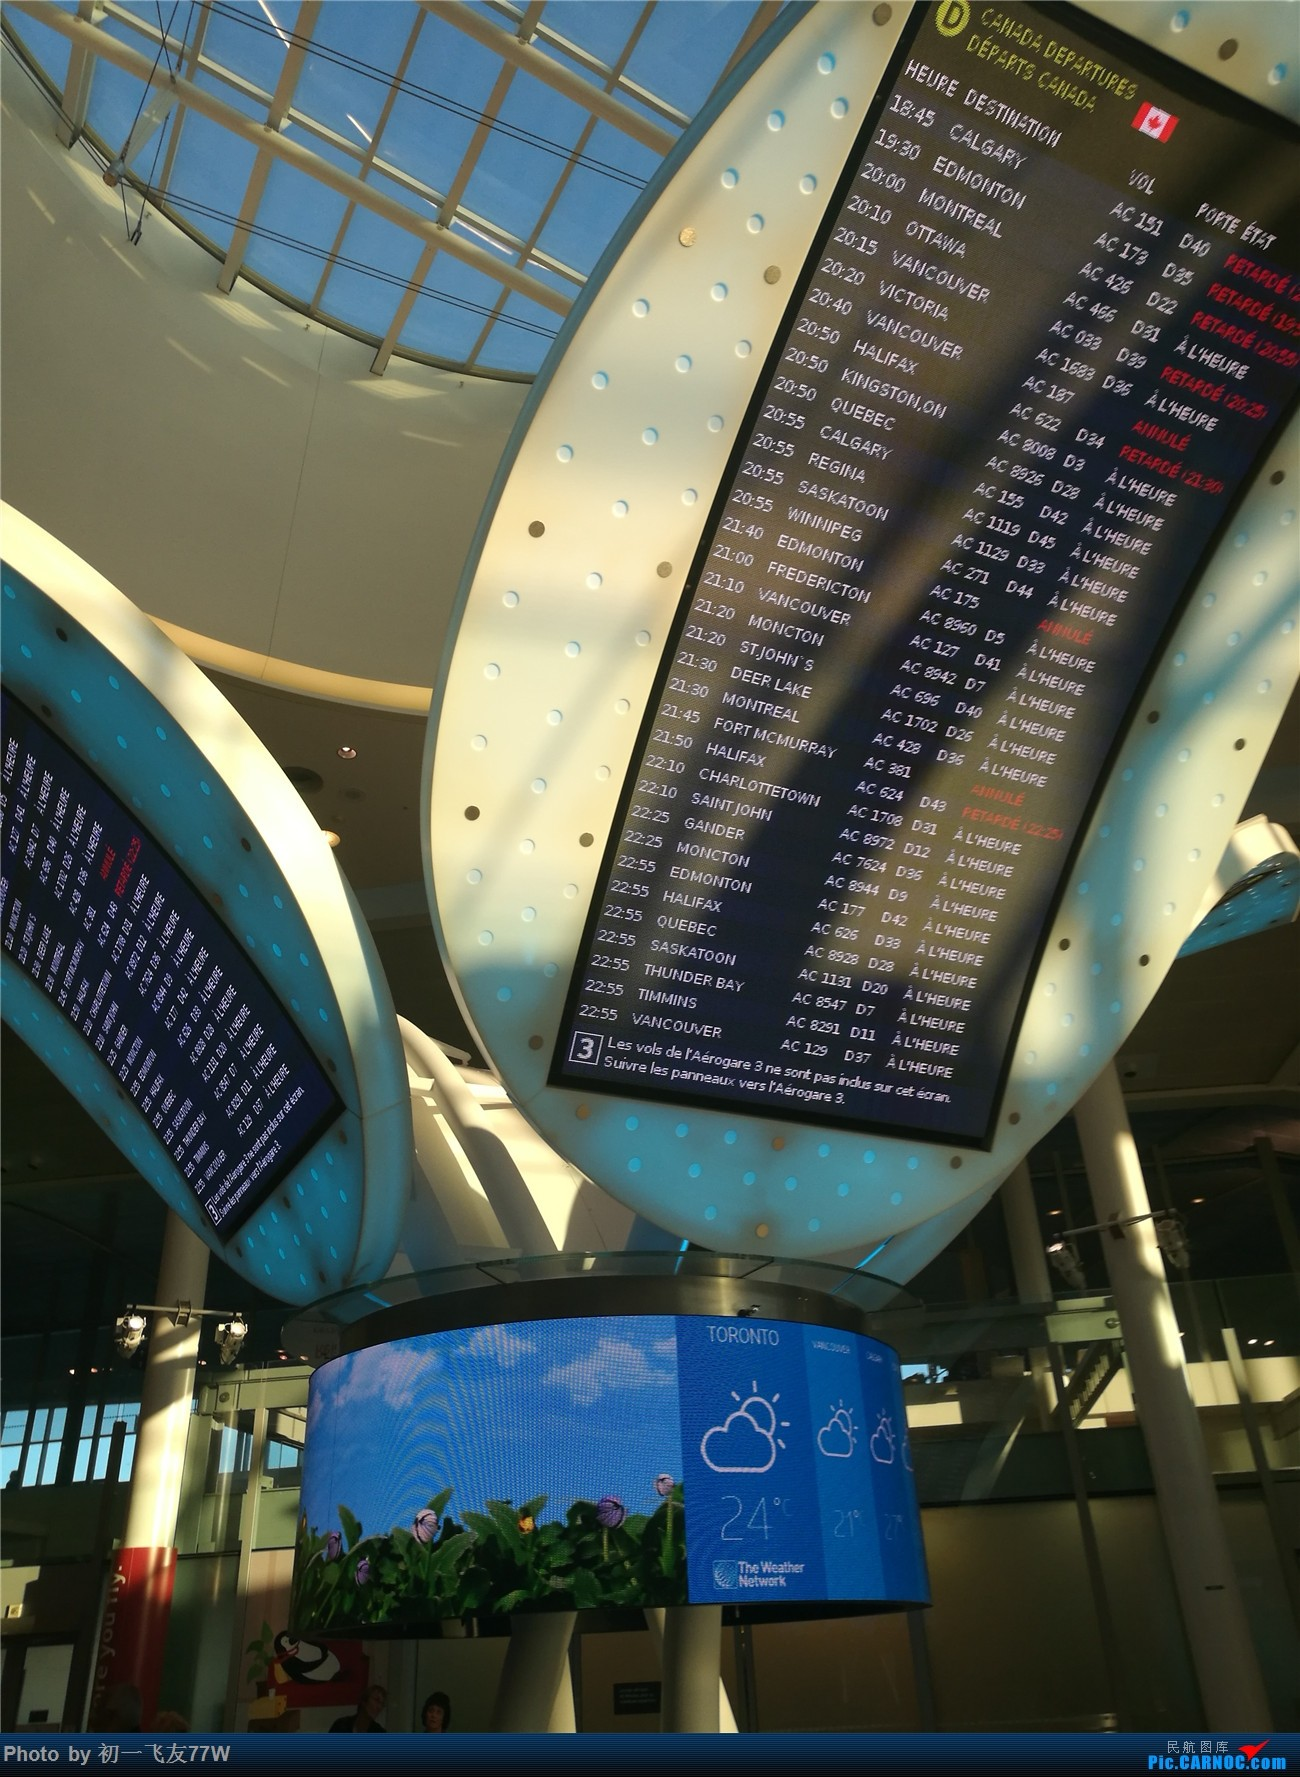 Re:[原创]香港到蒙特利尔,中转多伦多    加拿大多伦多皮尔逊机场